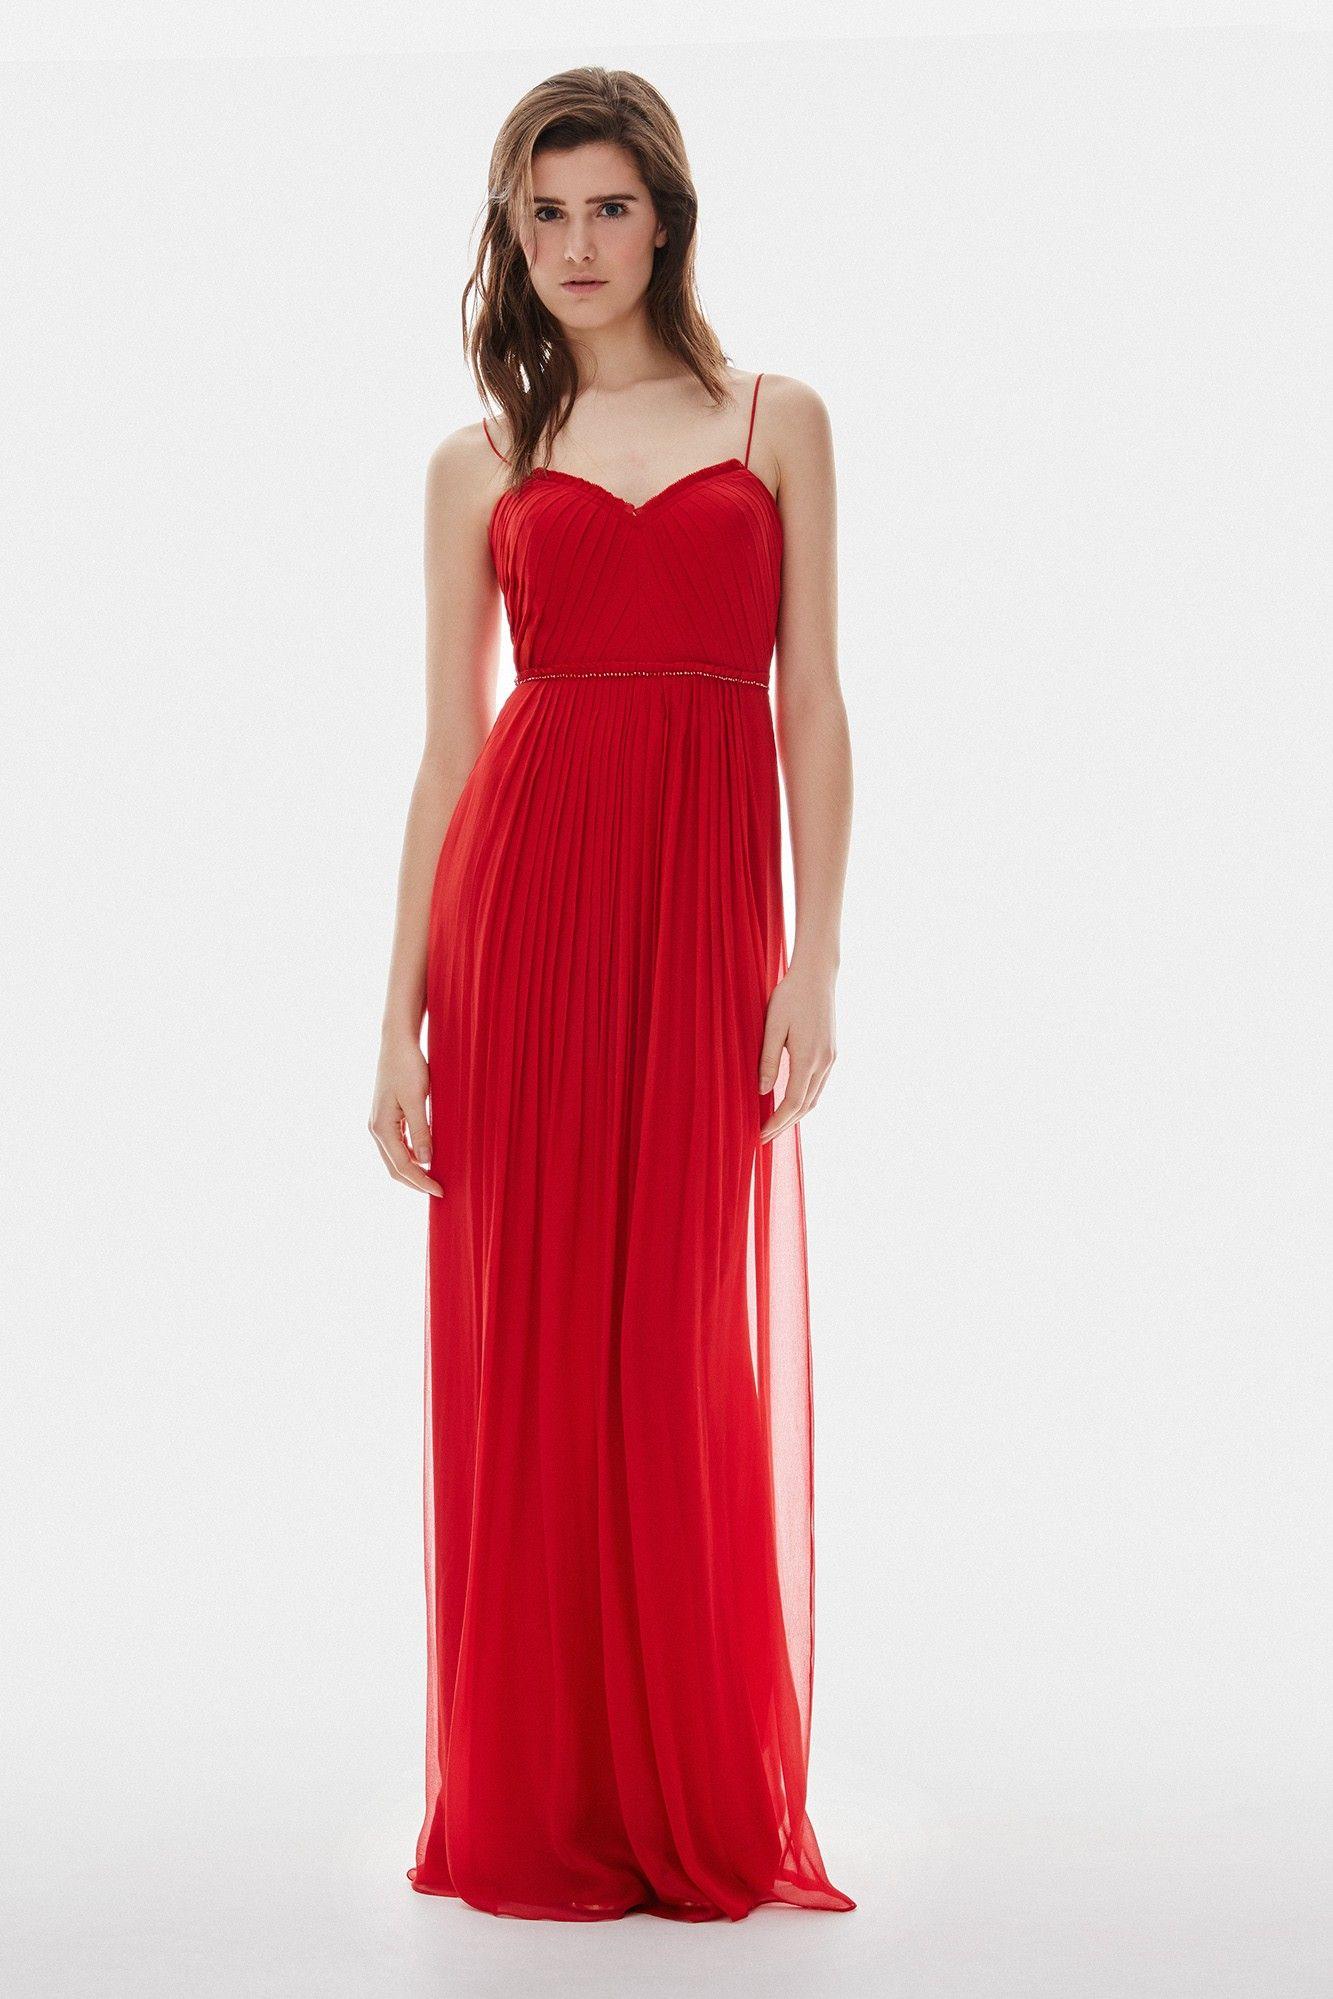 Vestido rojo de seda con corte imperio adolfo dominguez for Adolfo dominguez vestidos outlet